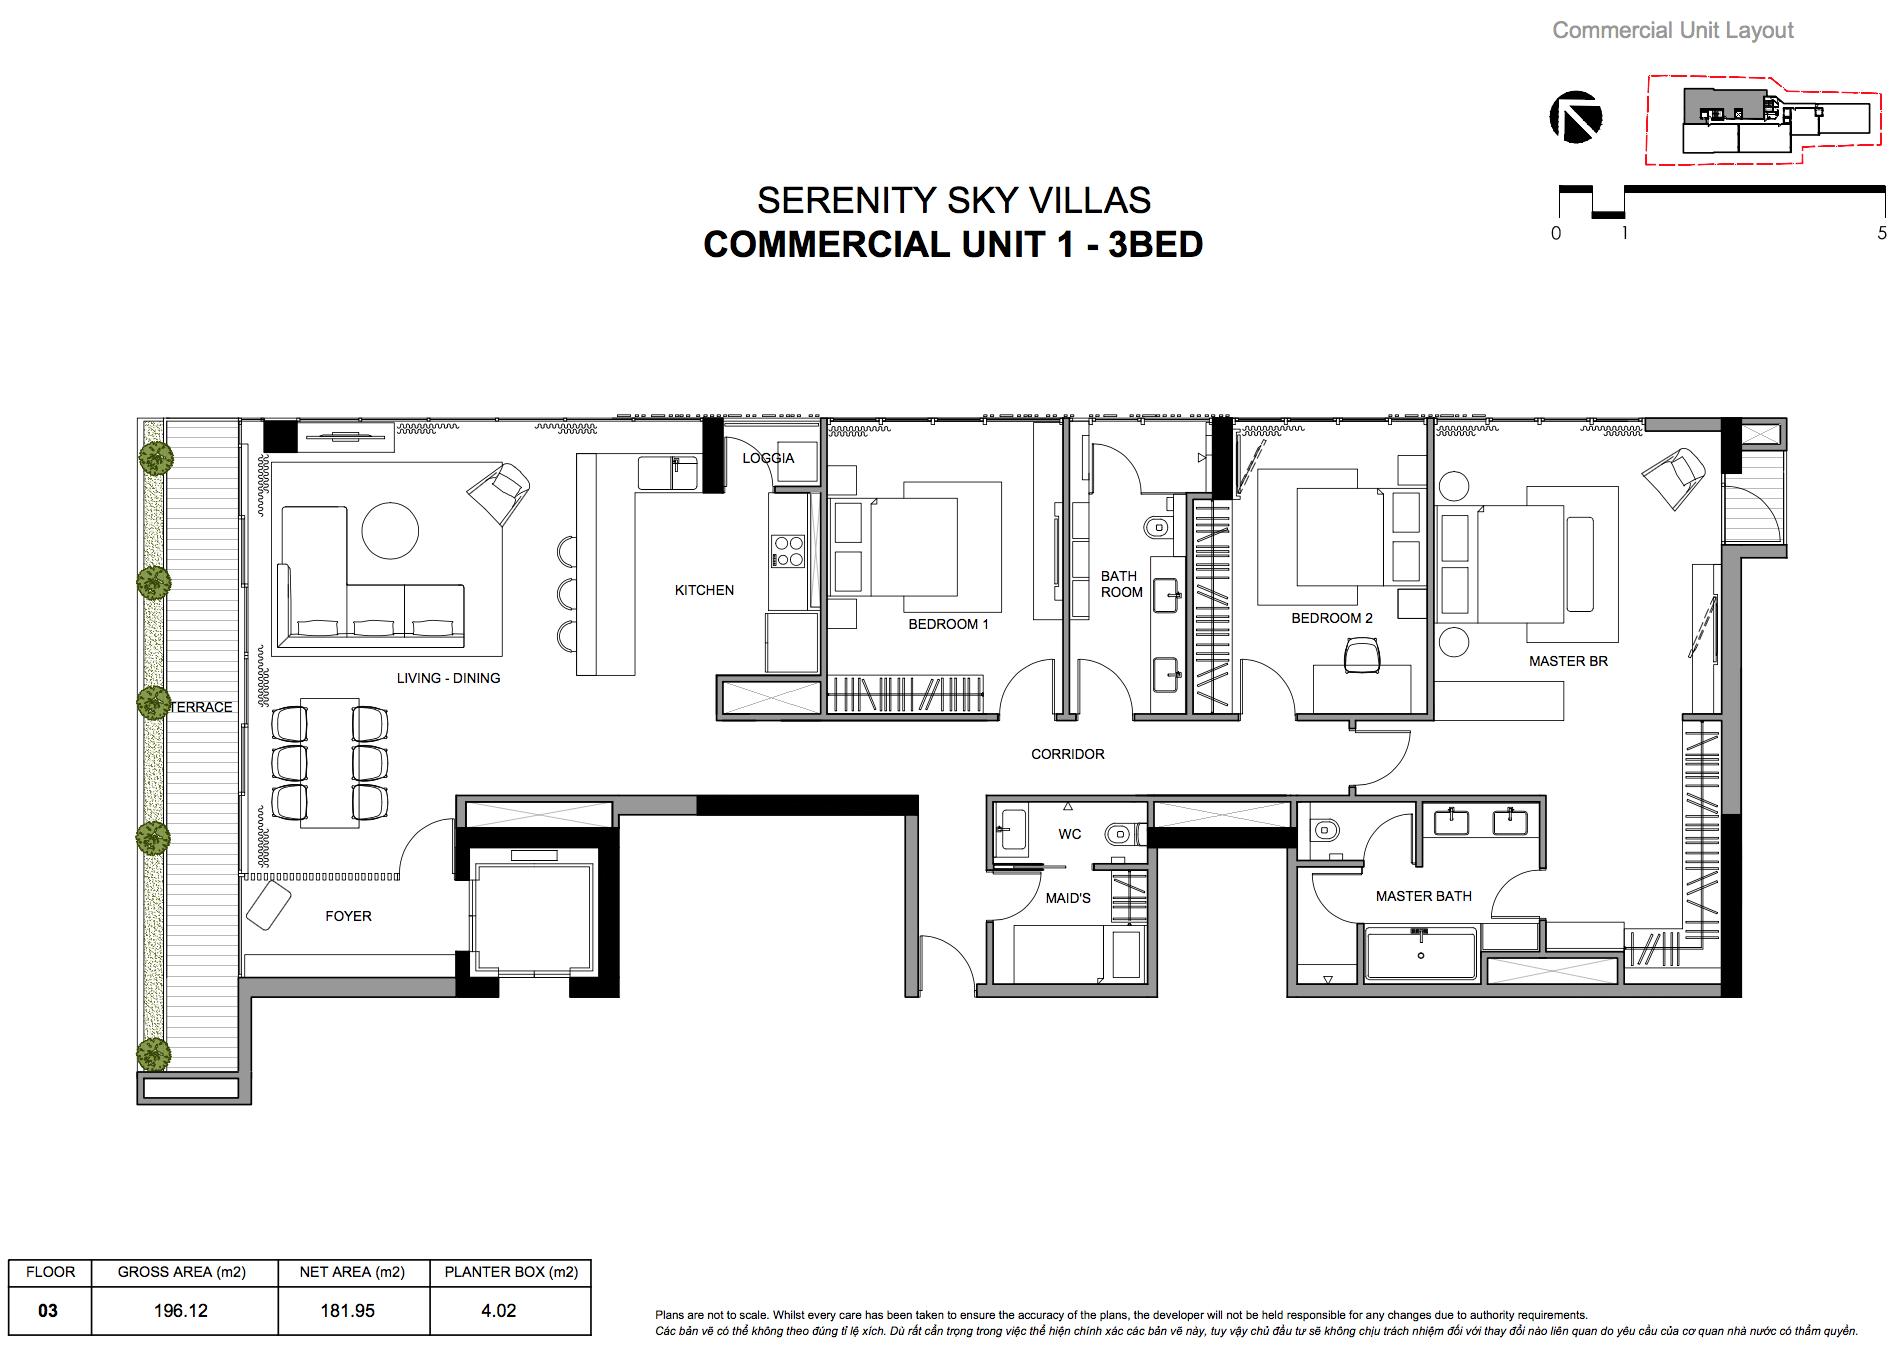 serenity-sky-villas-commercial-1-3-bed